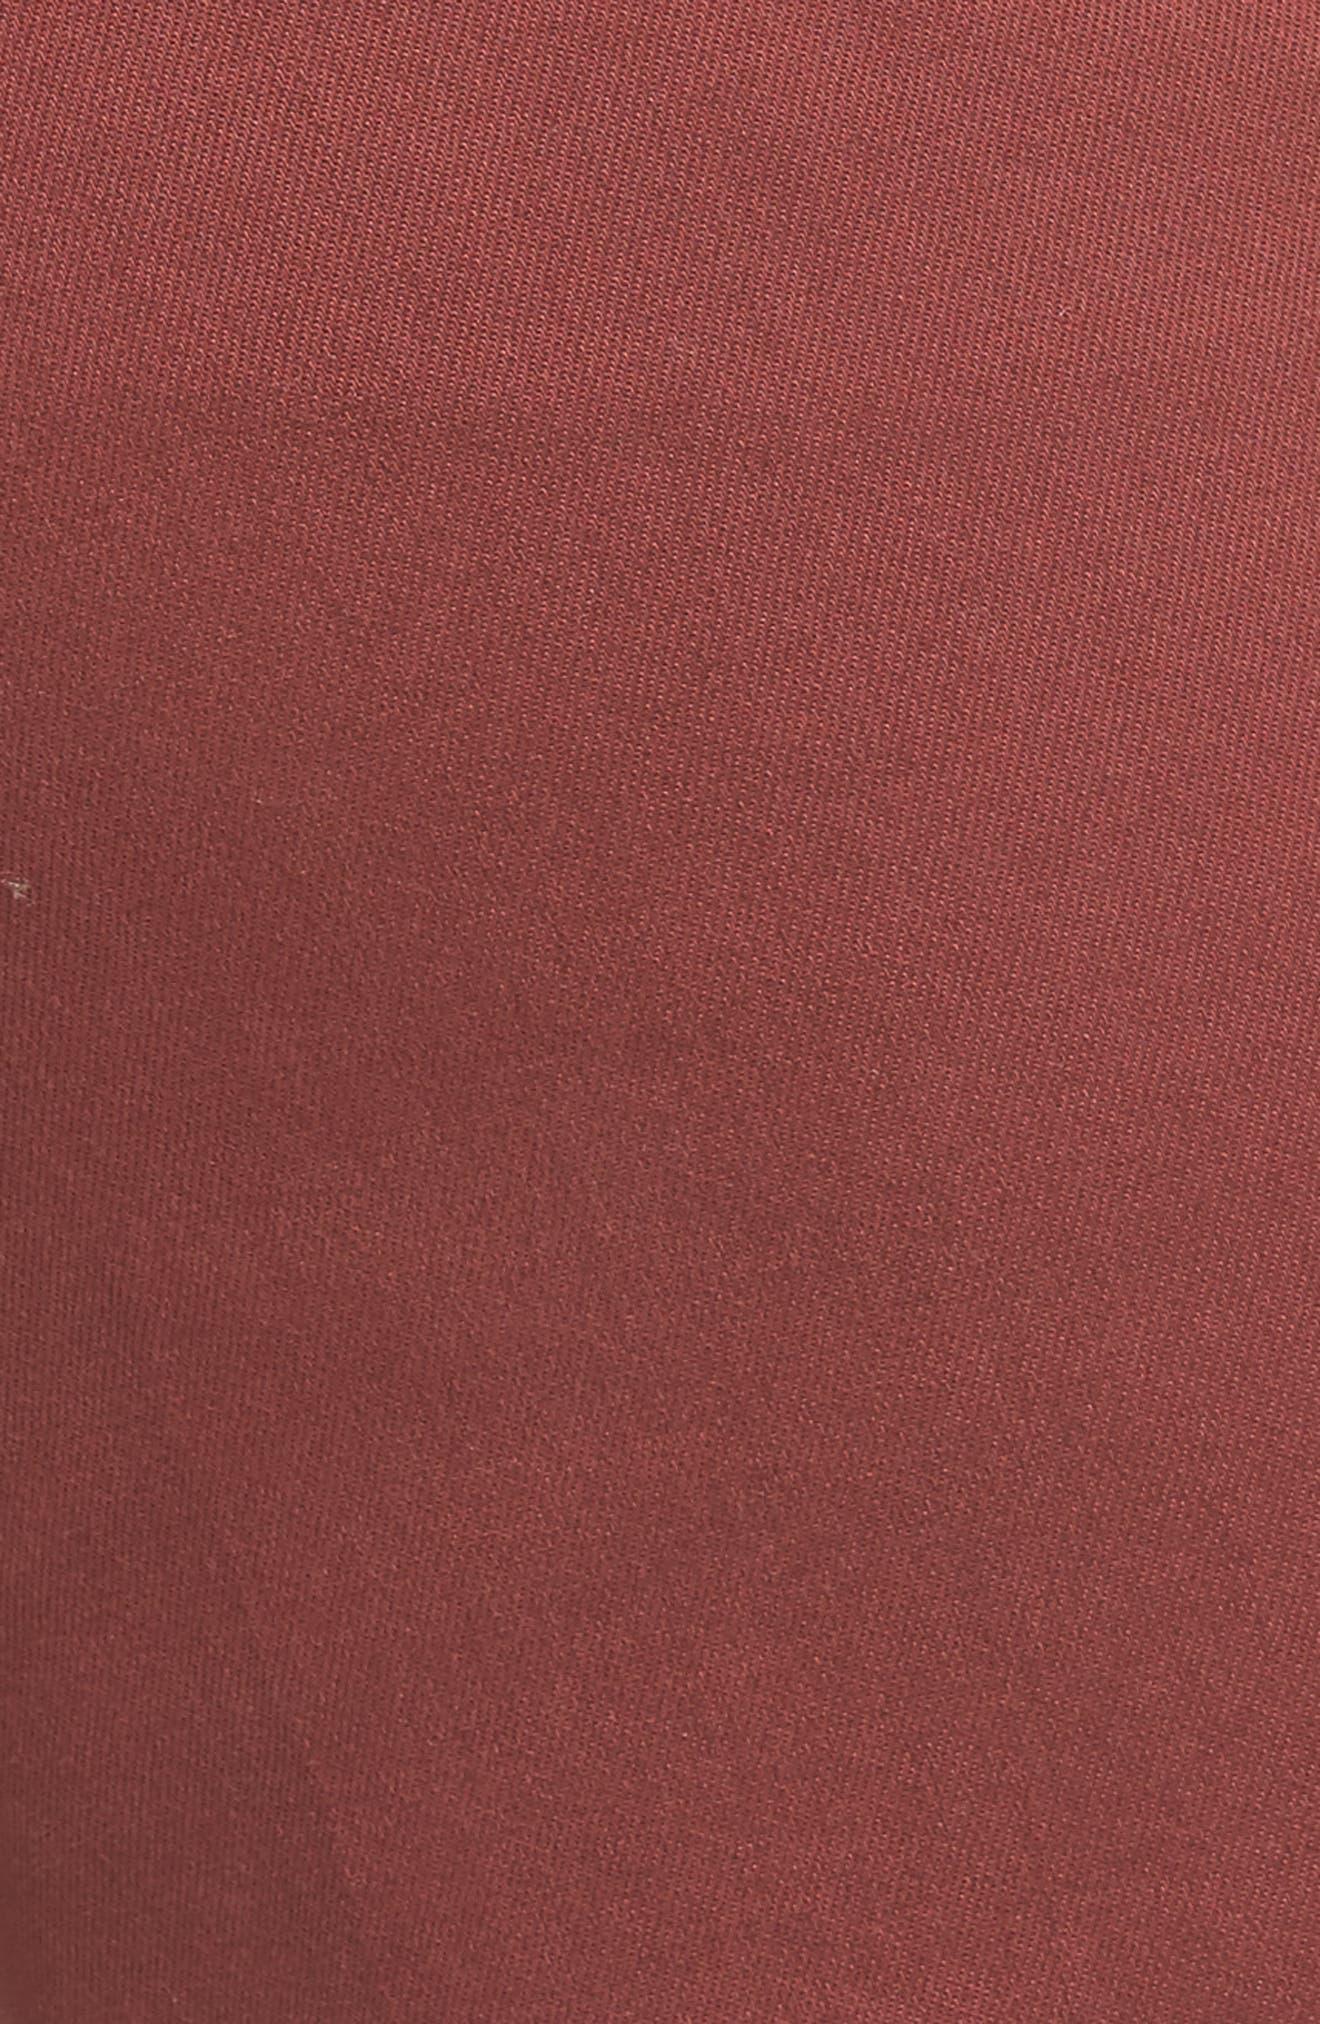 Skinny Cargo Pants,                             Alternate thumbnail 69, color,